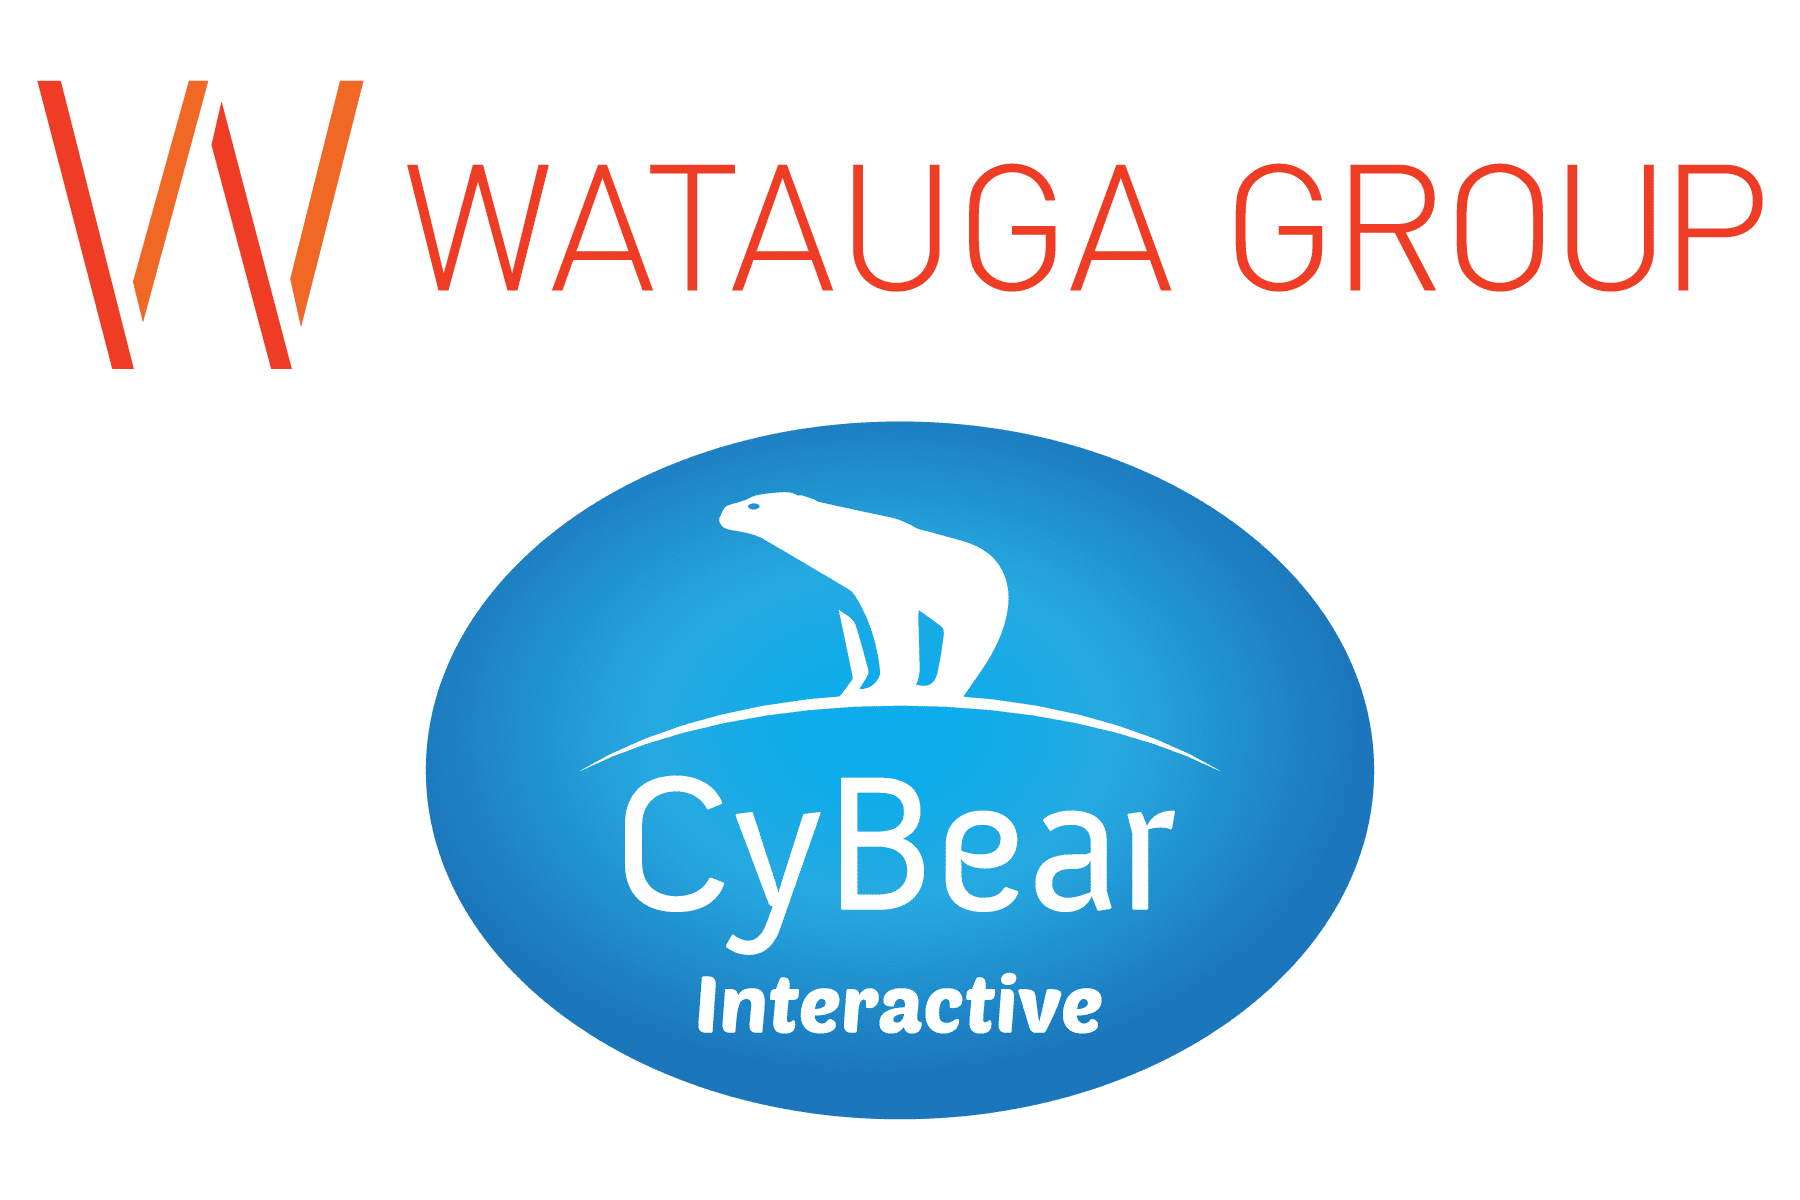 http://atlantaadclub.org/wp-content/uploads/2018/09/WataugaCyBear-logo_combo_horizontal.png